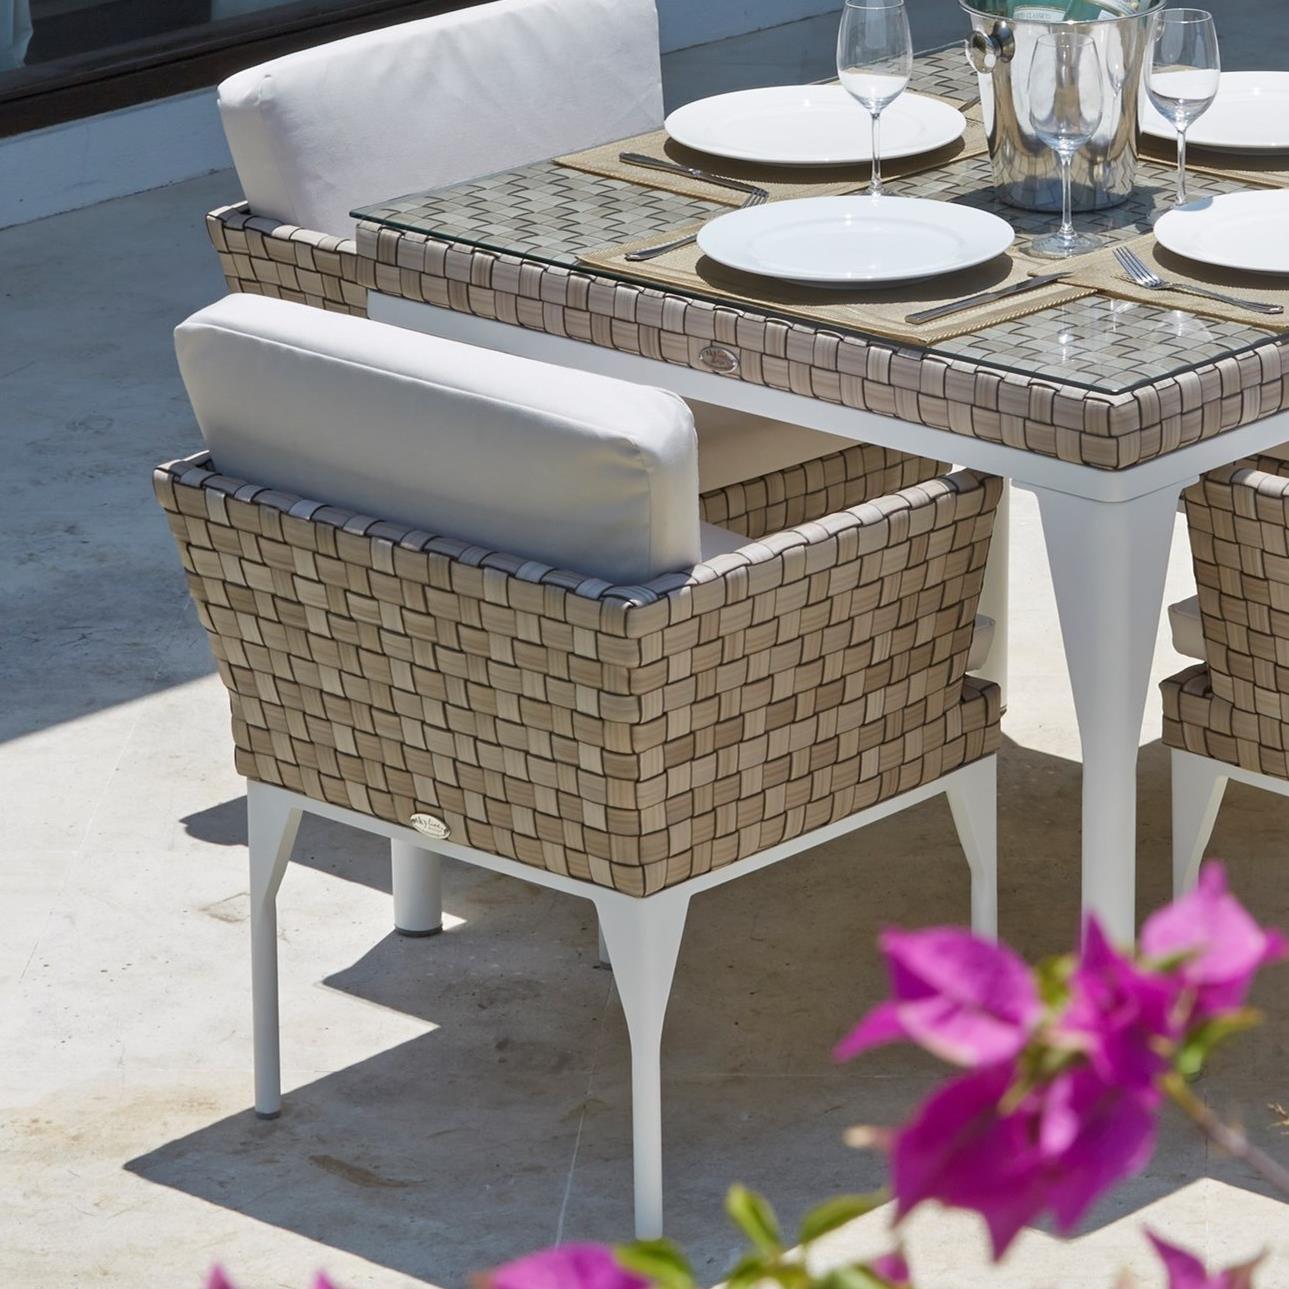 BRAFTA Outdoor Dining Armchair by Skyline Design at Baer's Furniture